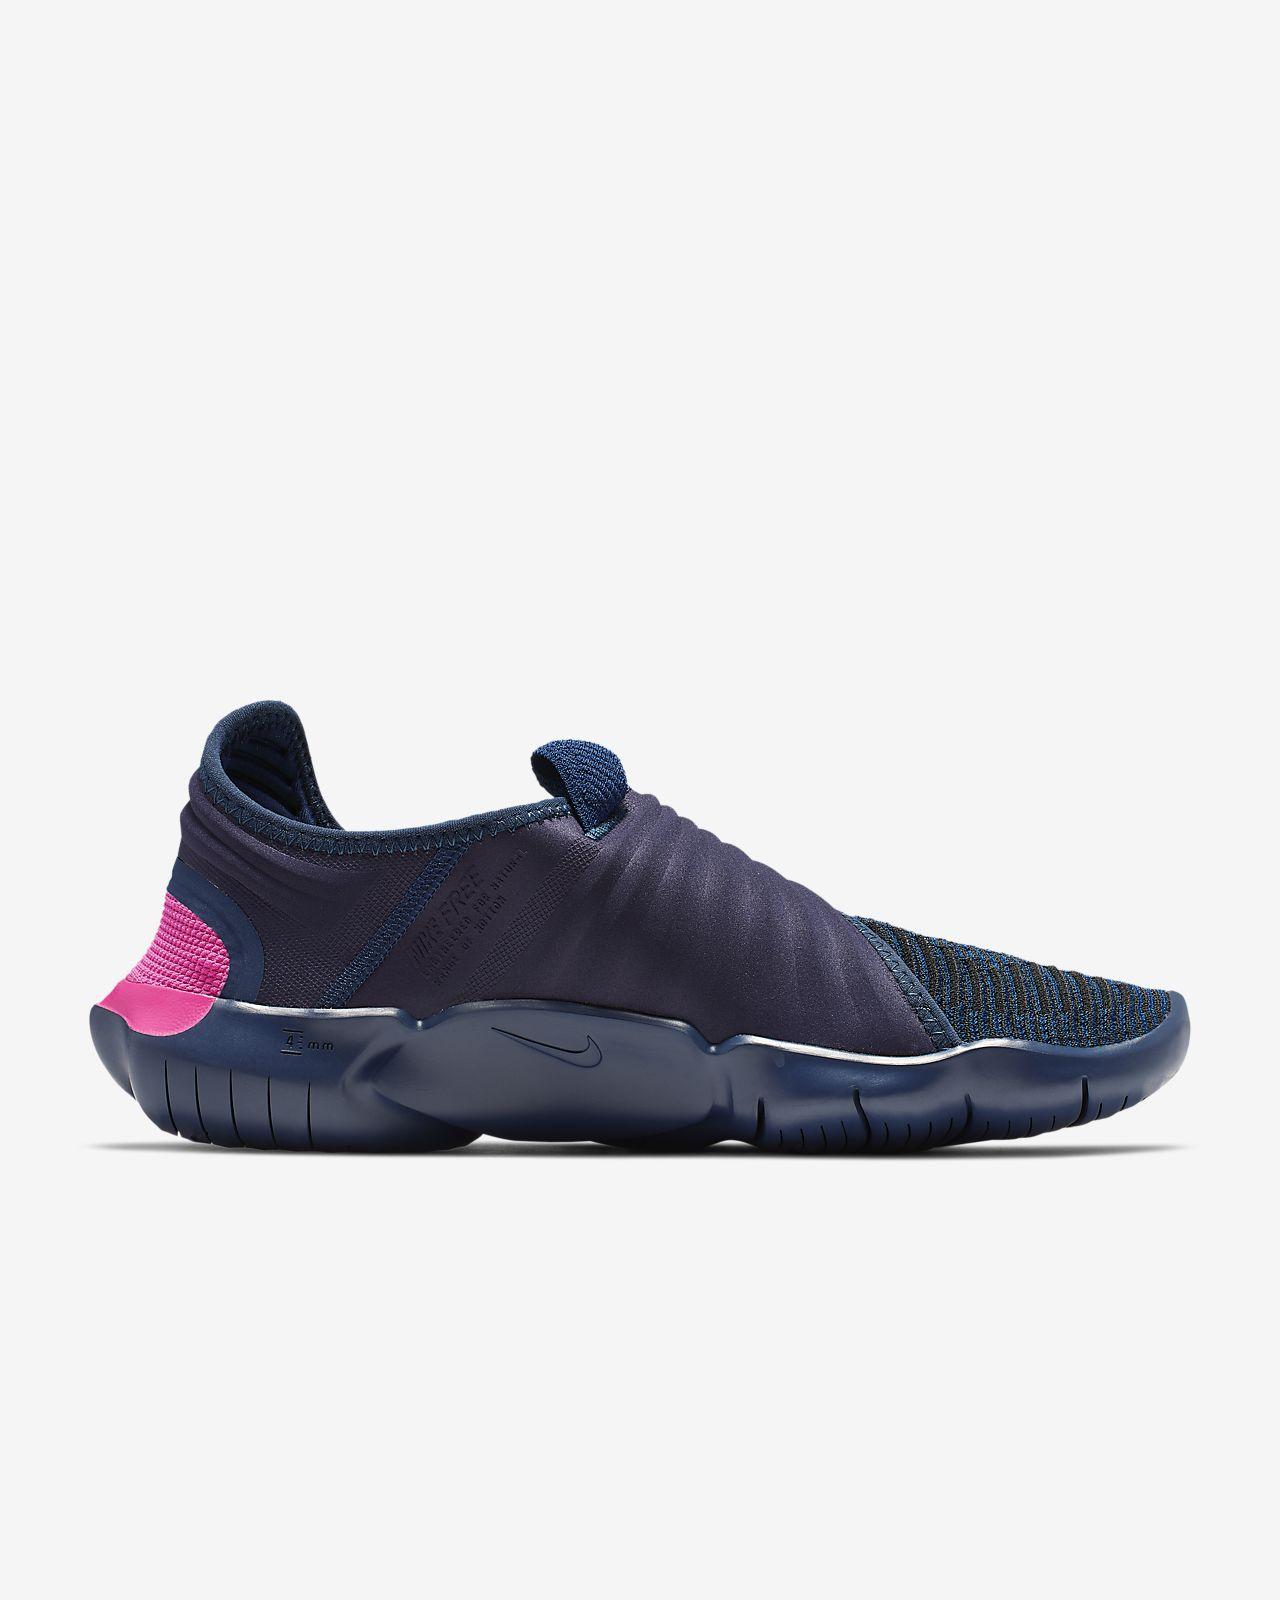 official photos b361c 73fda ... Nike Free RN Flyknit 3.0 Men s Running Shoe